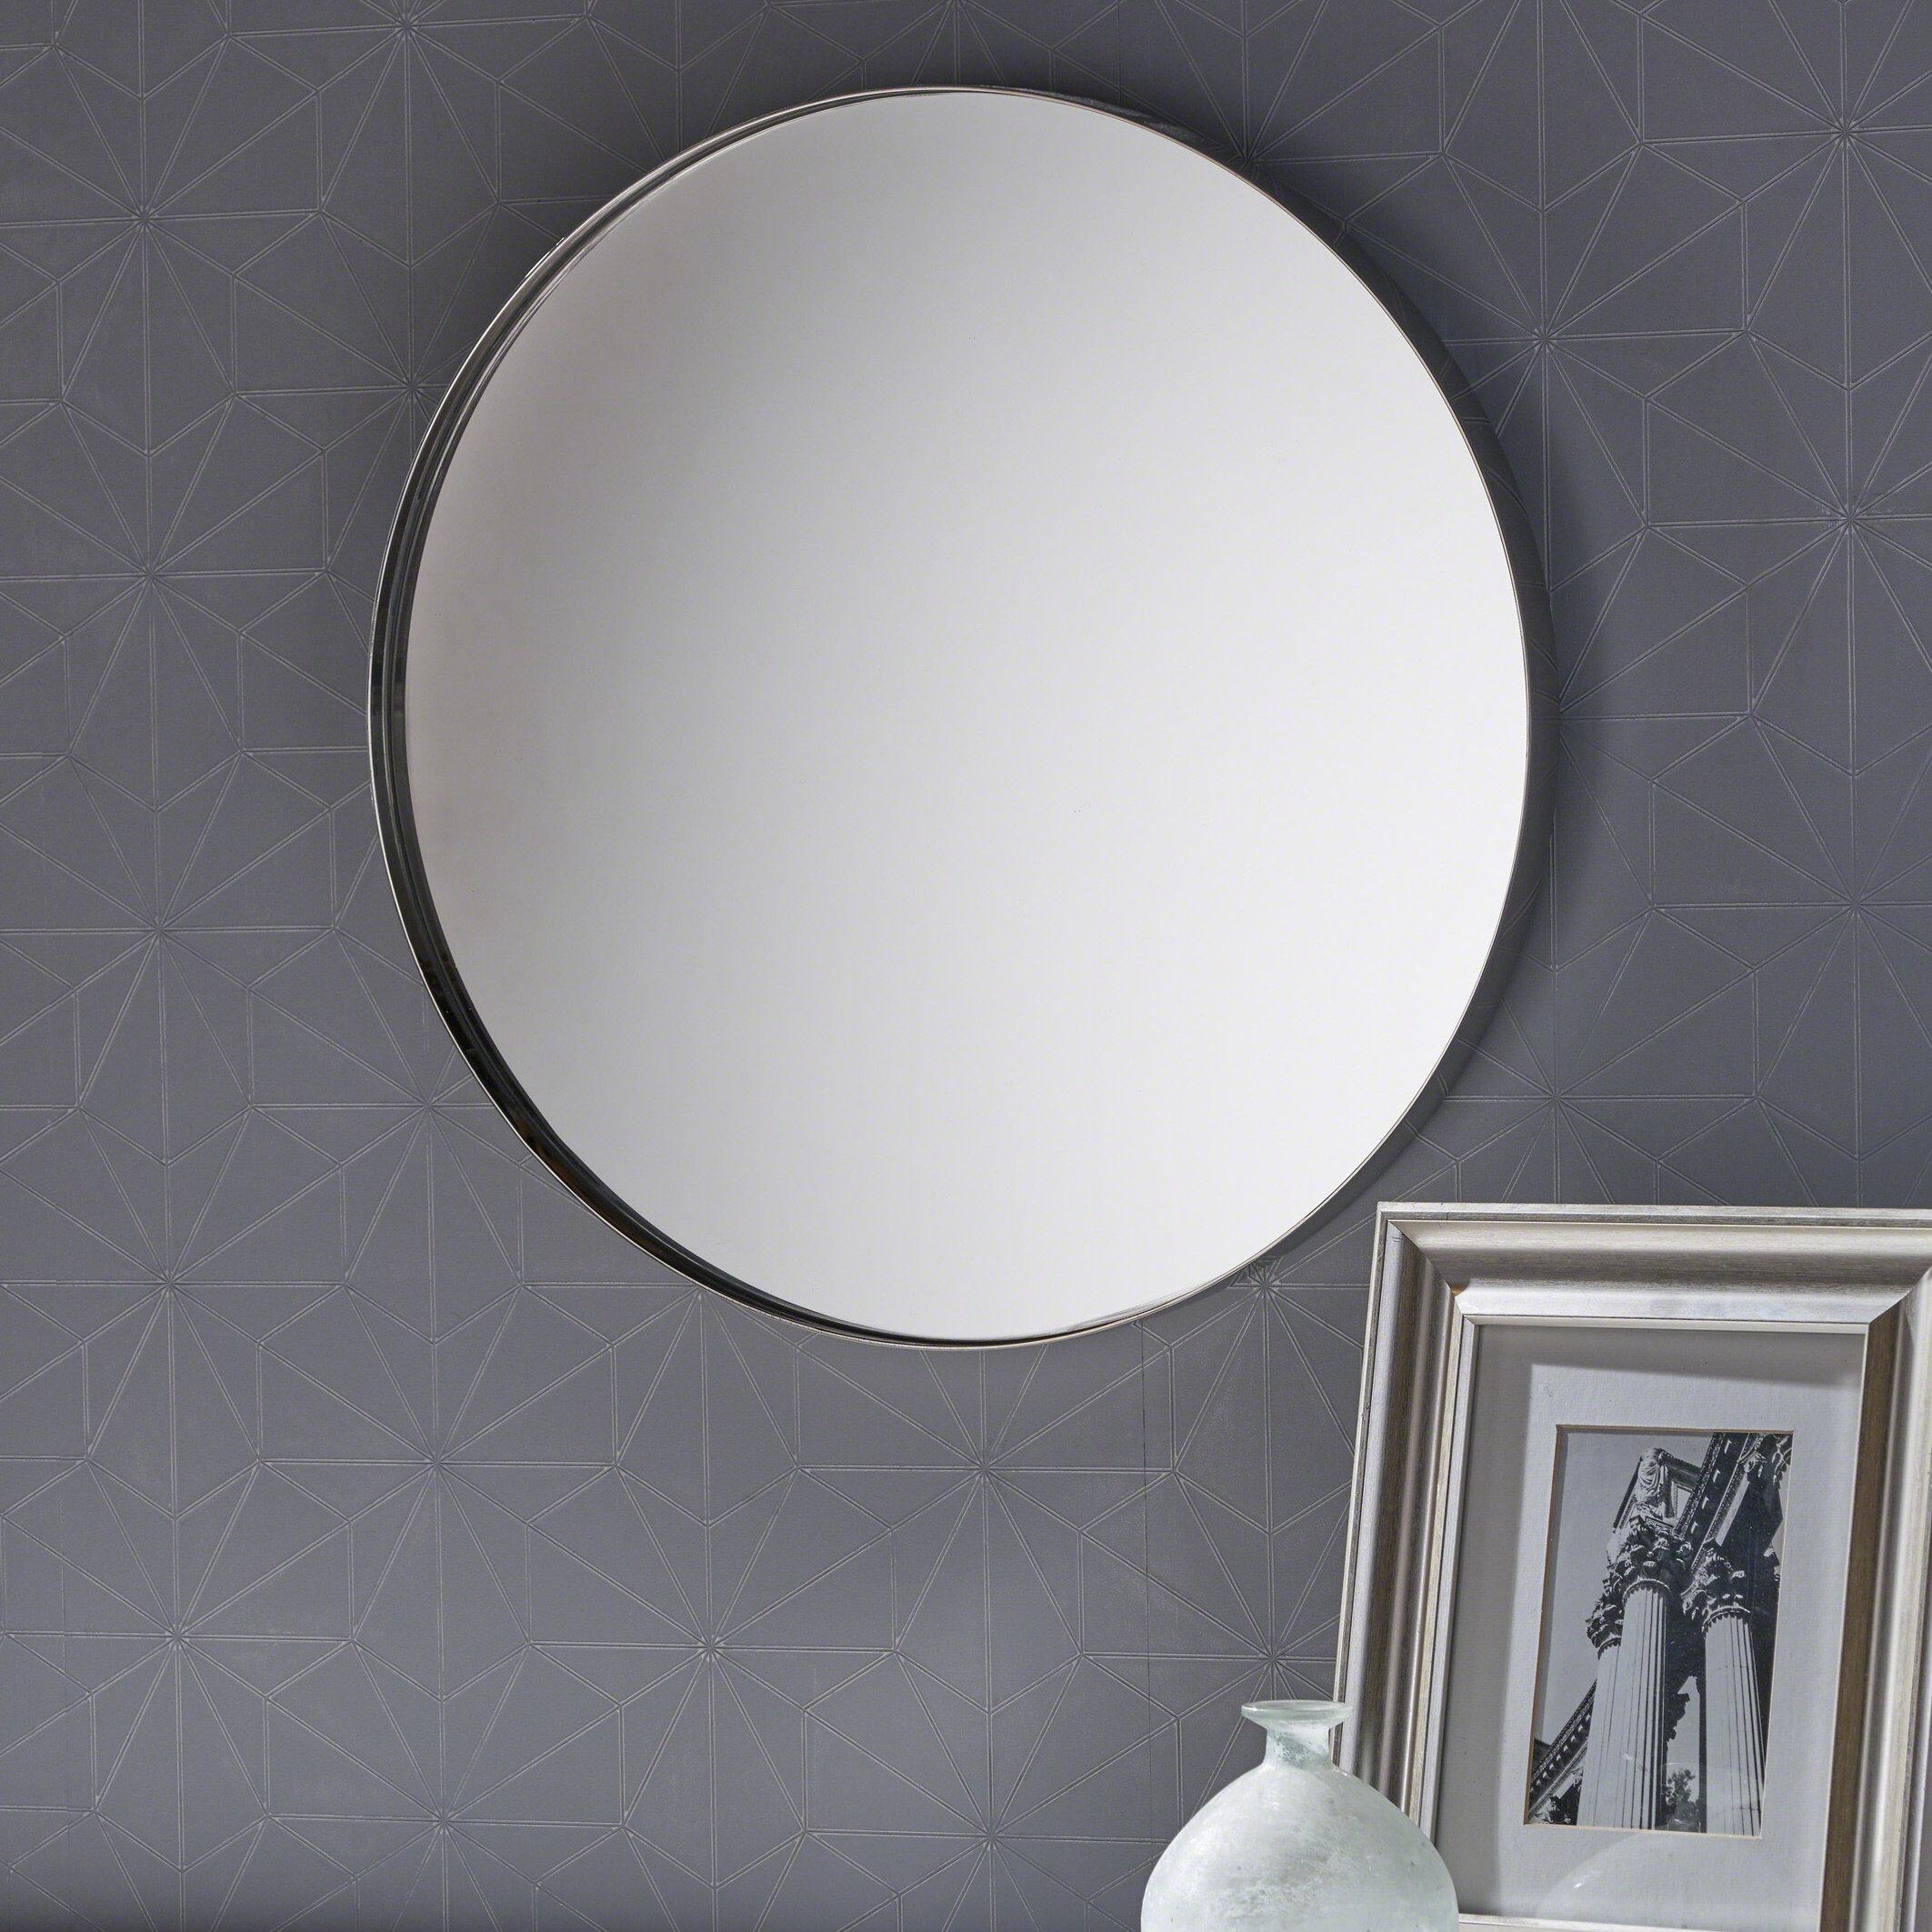 House of Hampton Murchison Circular Wall Bathroom Mirror | Wayfair